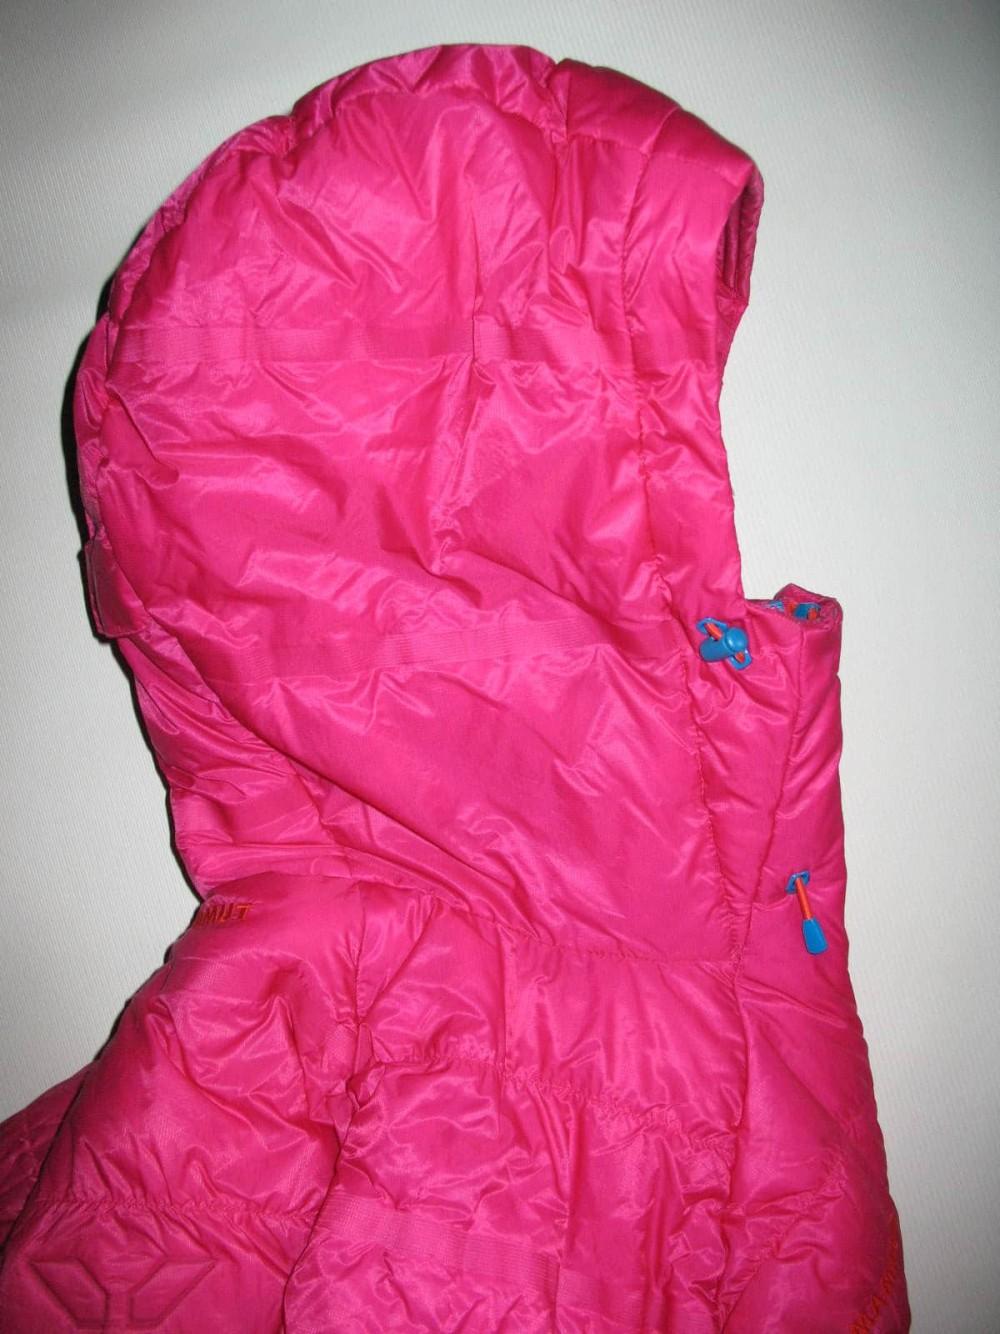 Куртка MAMMUT biwak eiger extreme jacket lady (размер S/M),3200 грн - 10